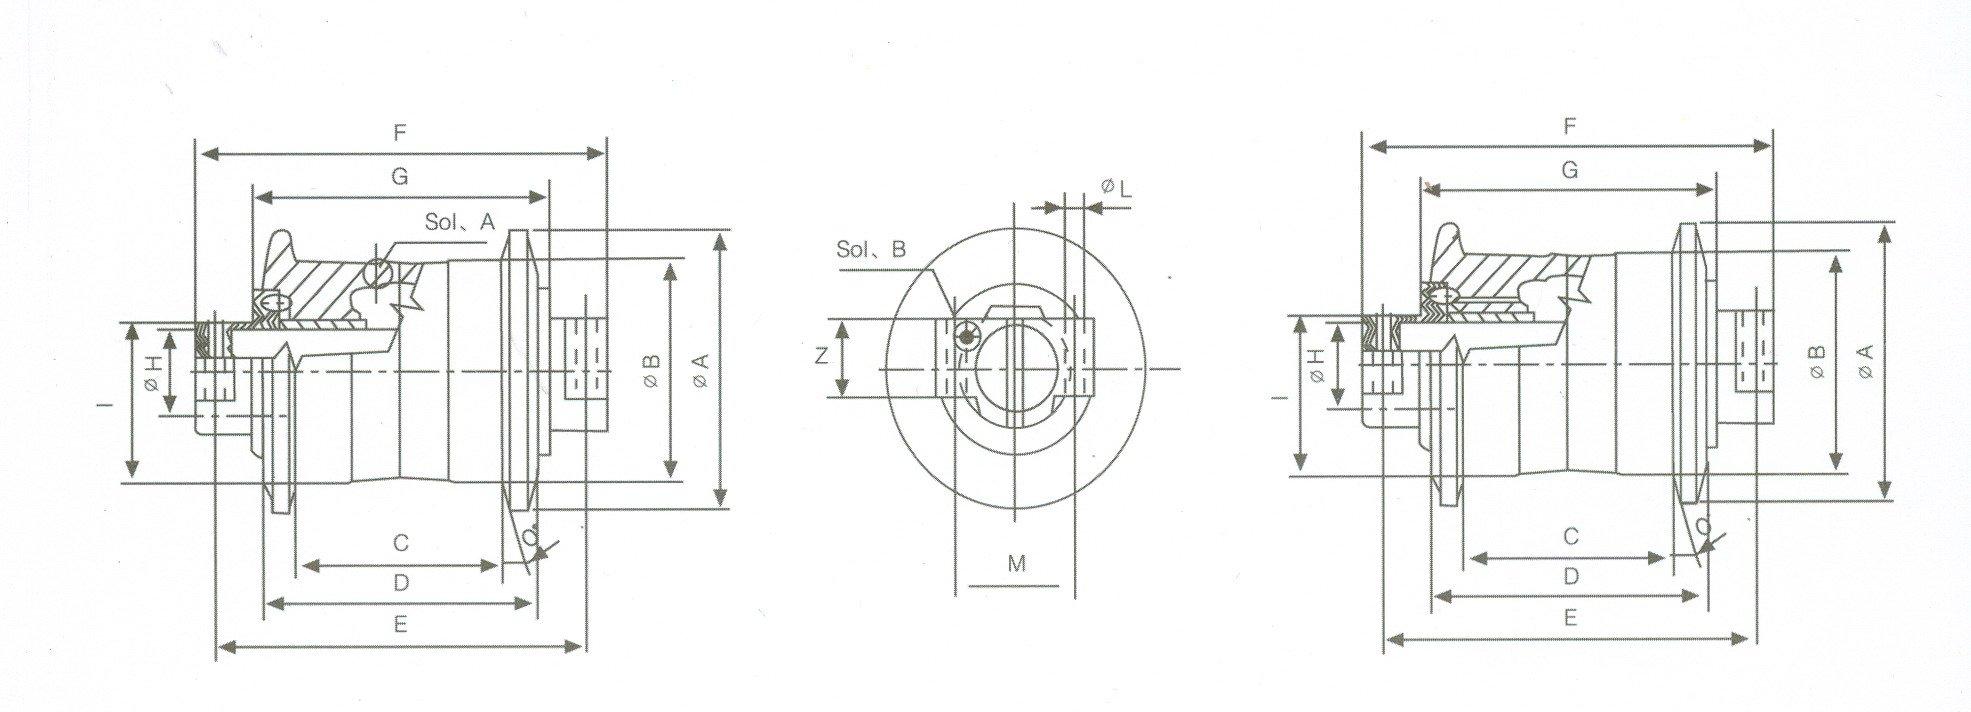 cat d8n wiring diagram sell excavator tamroc 600 bottom roller track roller idler  sell excavator tamroc 600 bottom roller track roller idler